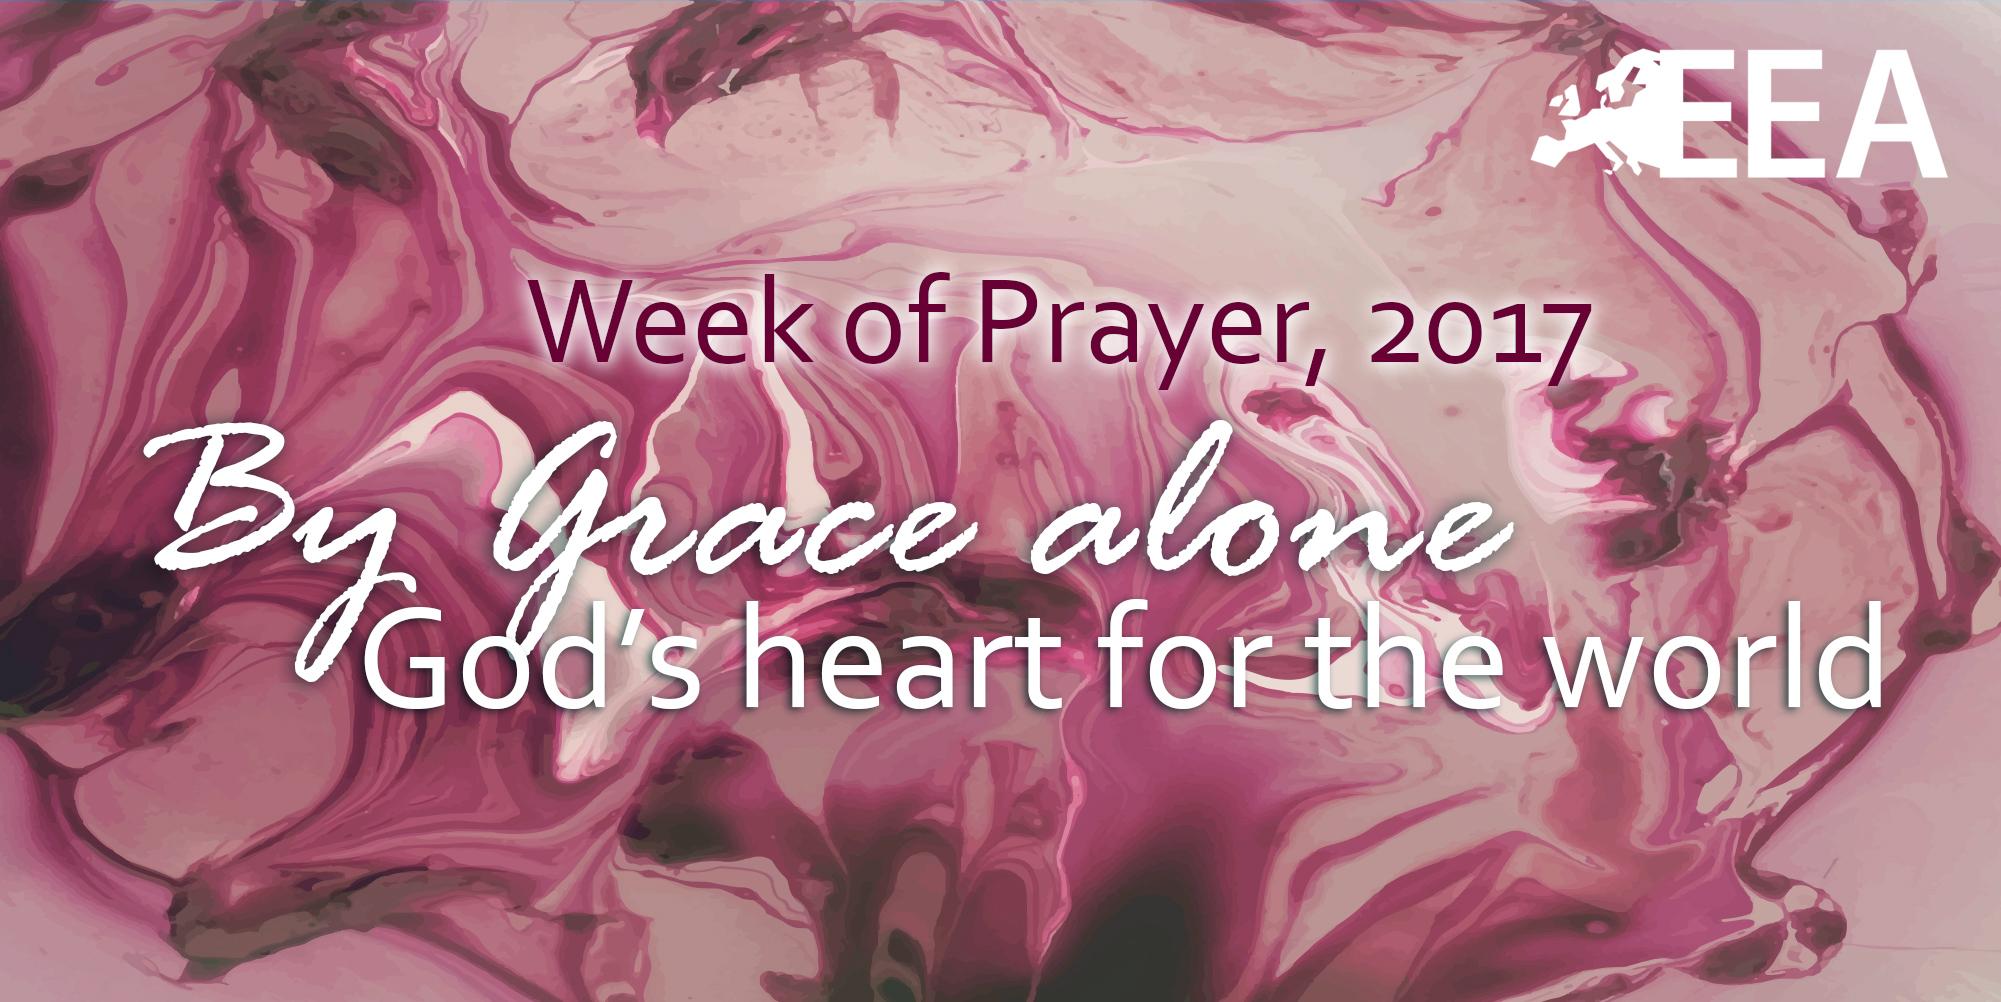 Daily Devotional: Friday, 13 January 2017